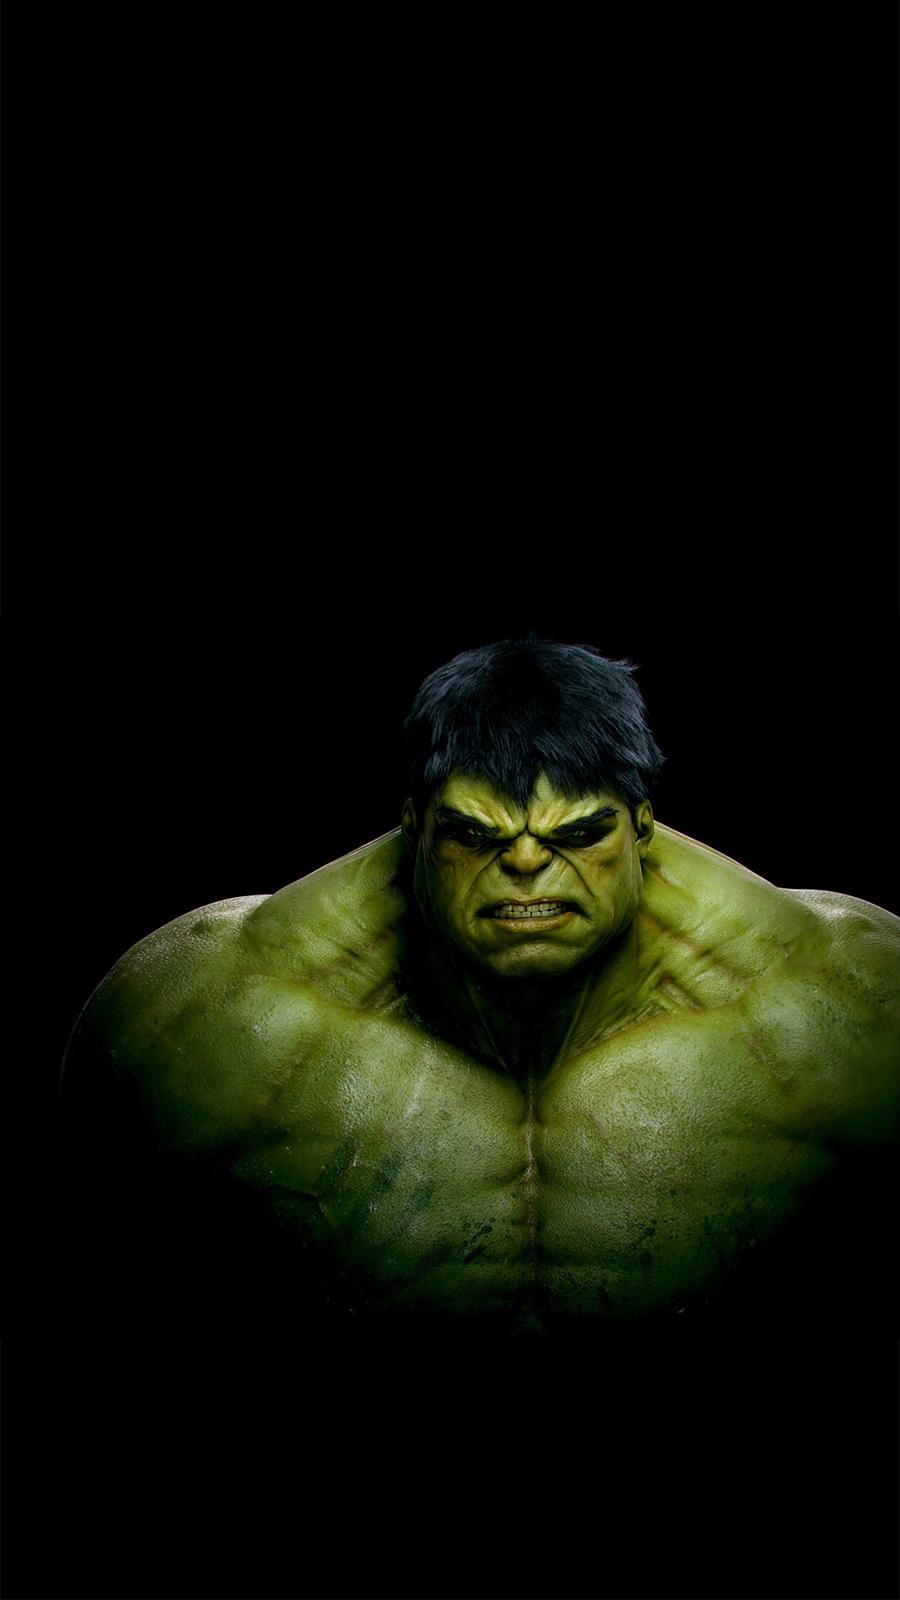 The Incredible Hulk Dark Android Wallpaper